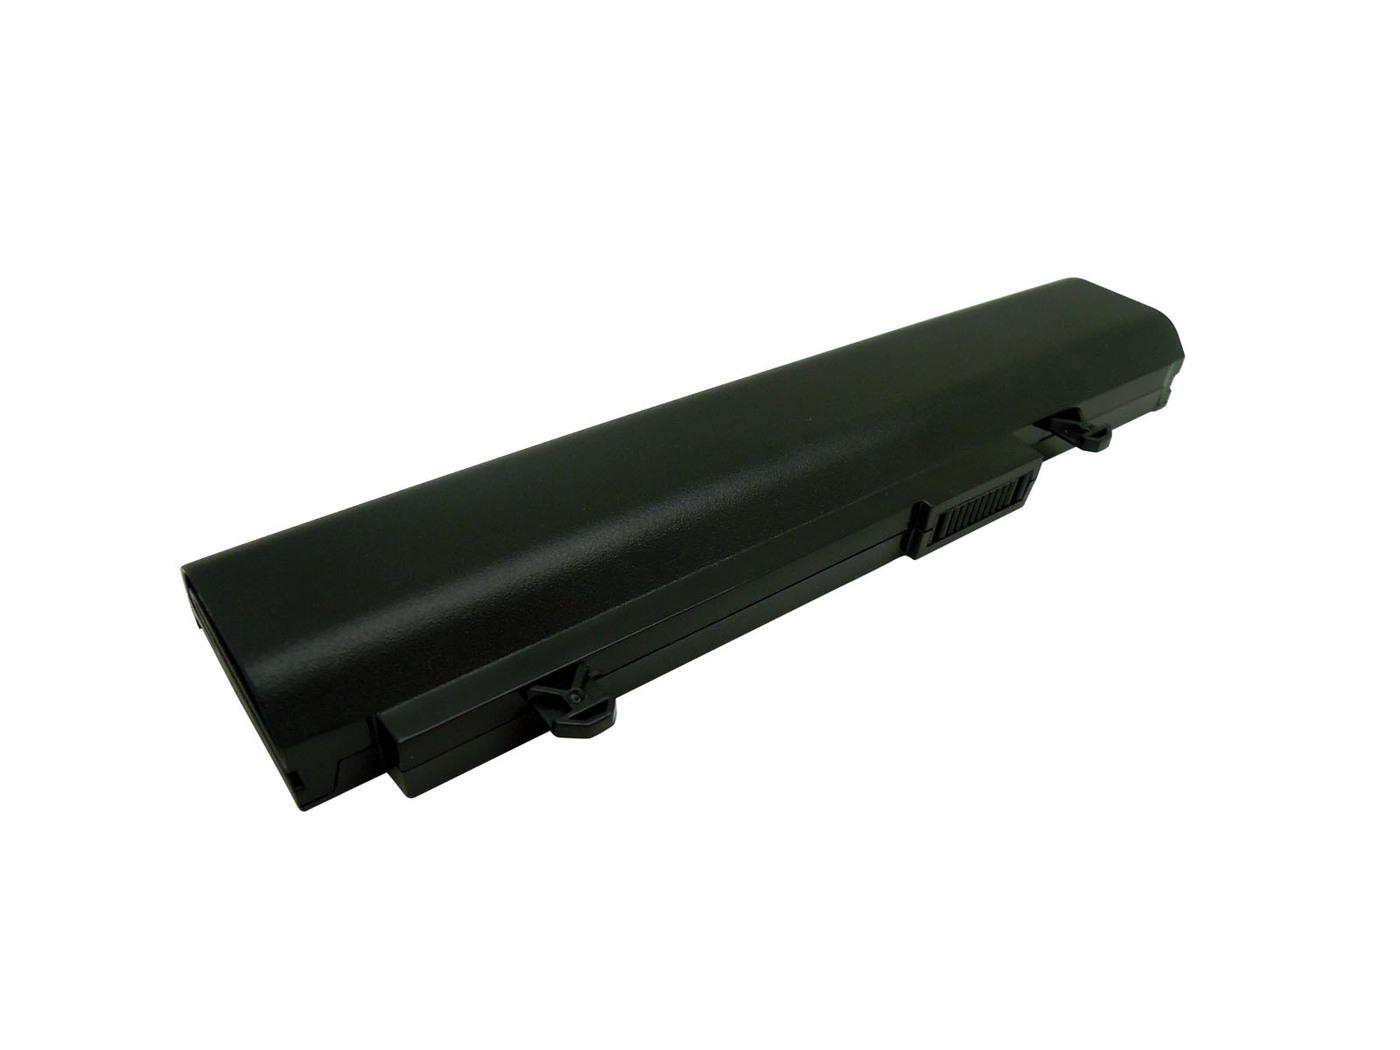 Аккумуляторная батарея для ноутбука Asus (A32-1015) Asus Eee PC 1011, 1015, 1215, 1015P, 1016P, 1016, 1011PX, VX6